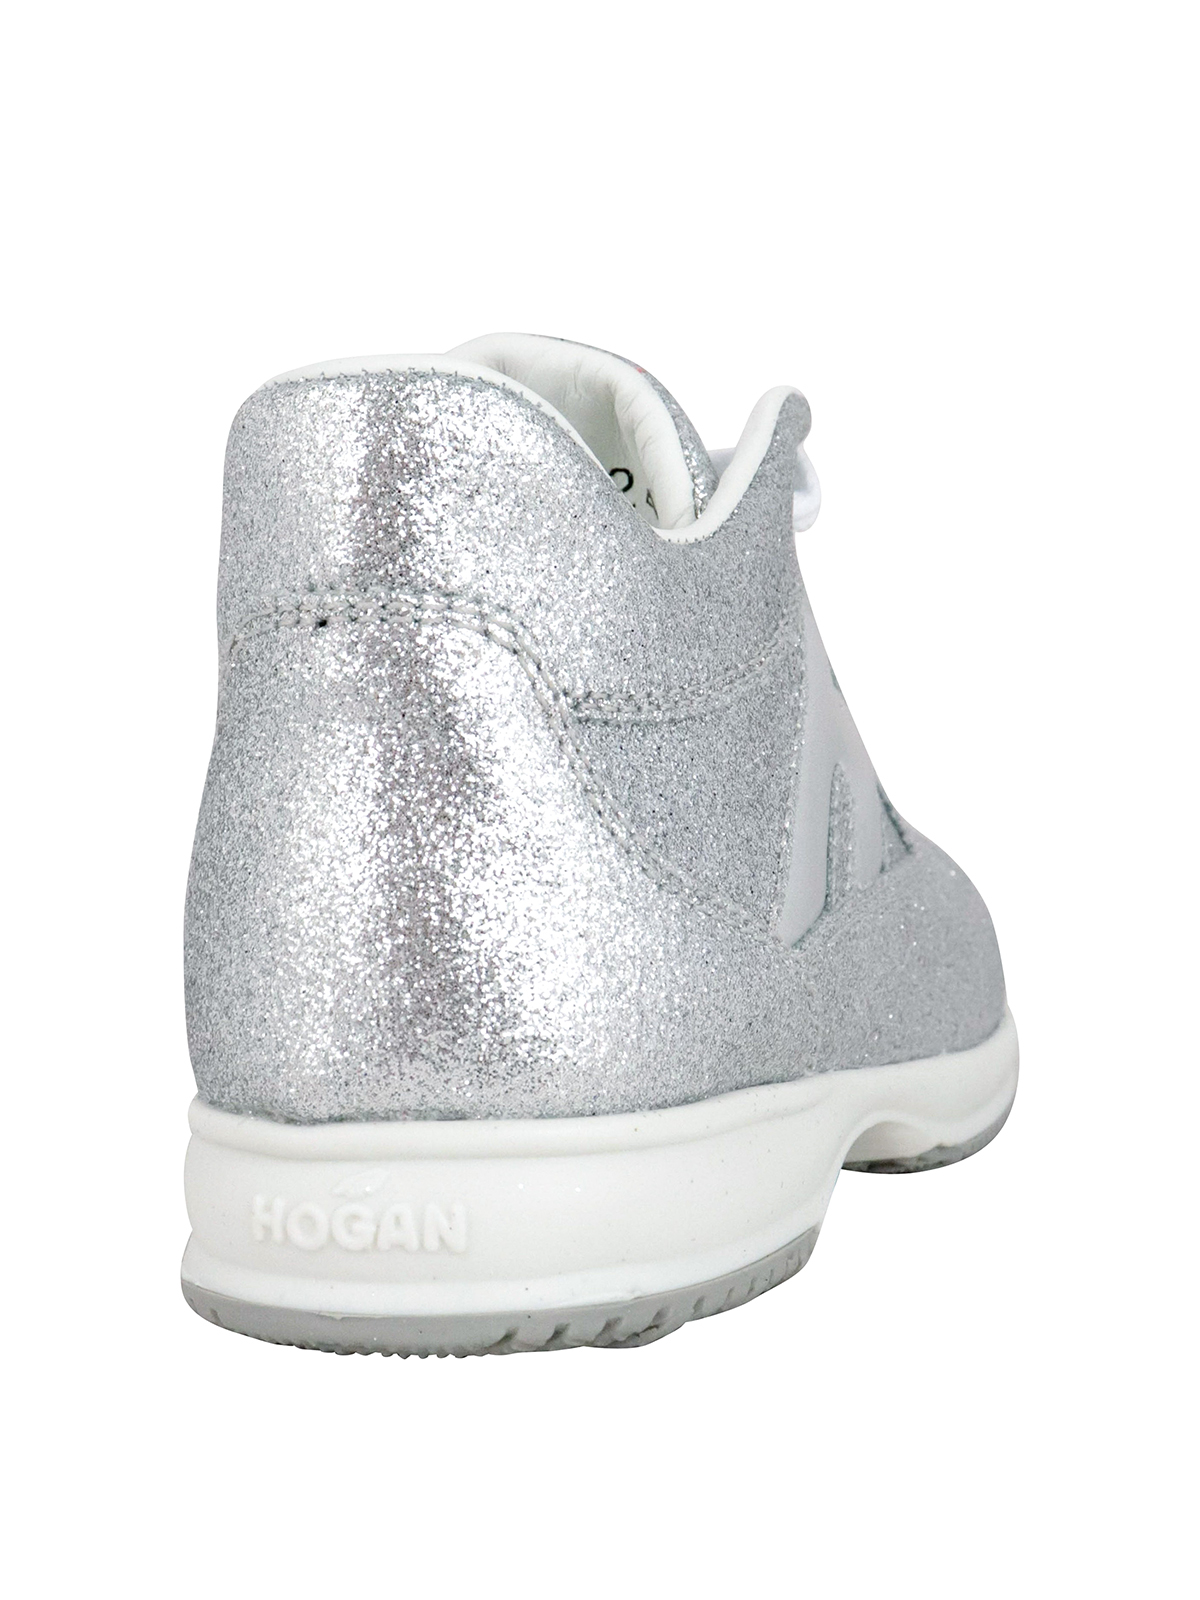 Trainers Hogan Junior - Interactive sneakers - HXT0920O243FTIB200